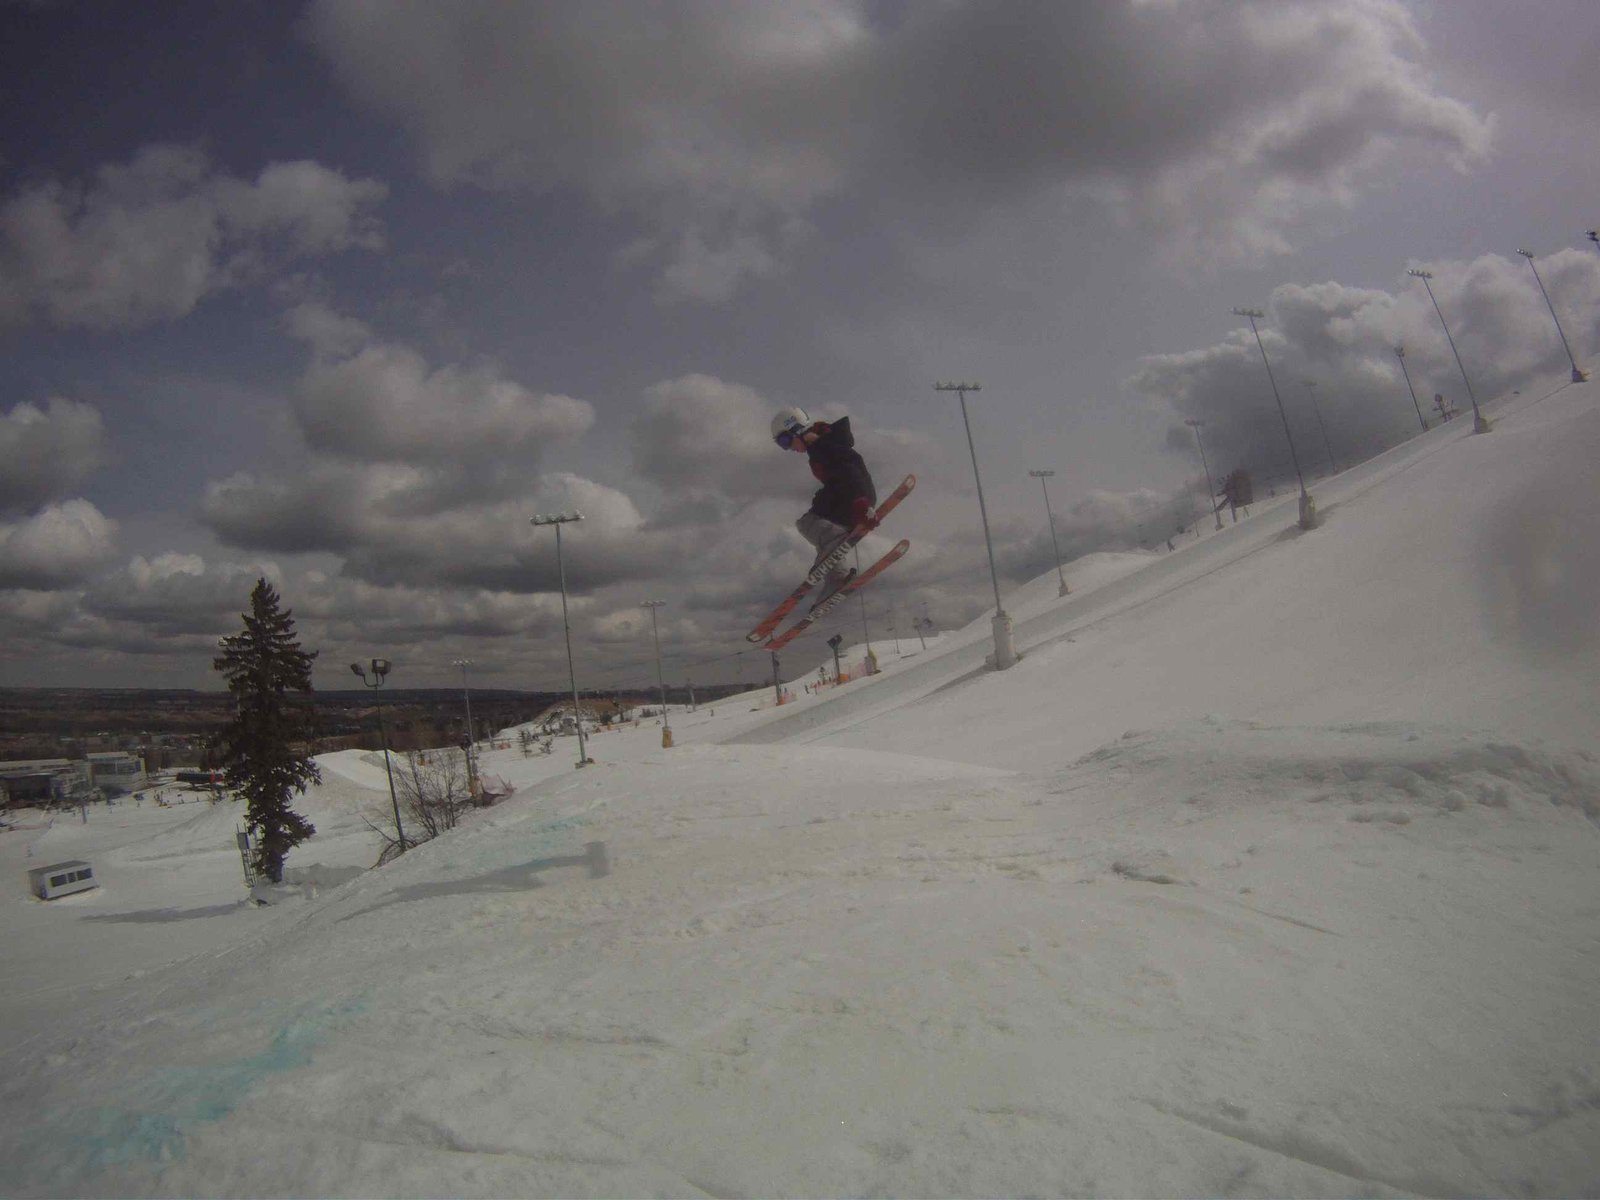 Luke does a jump